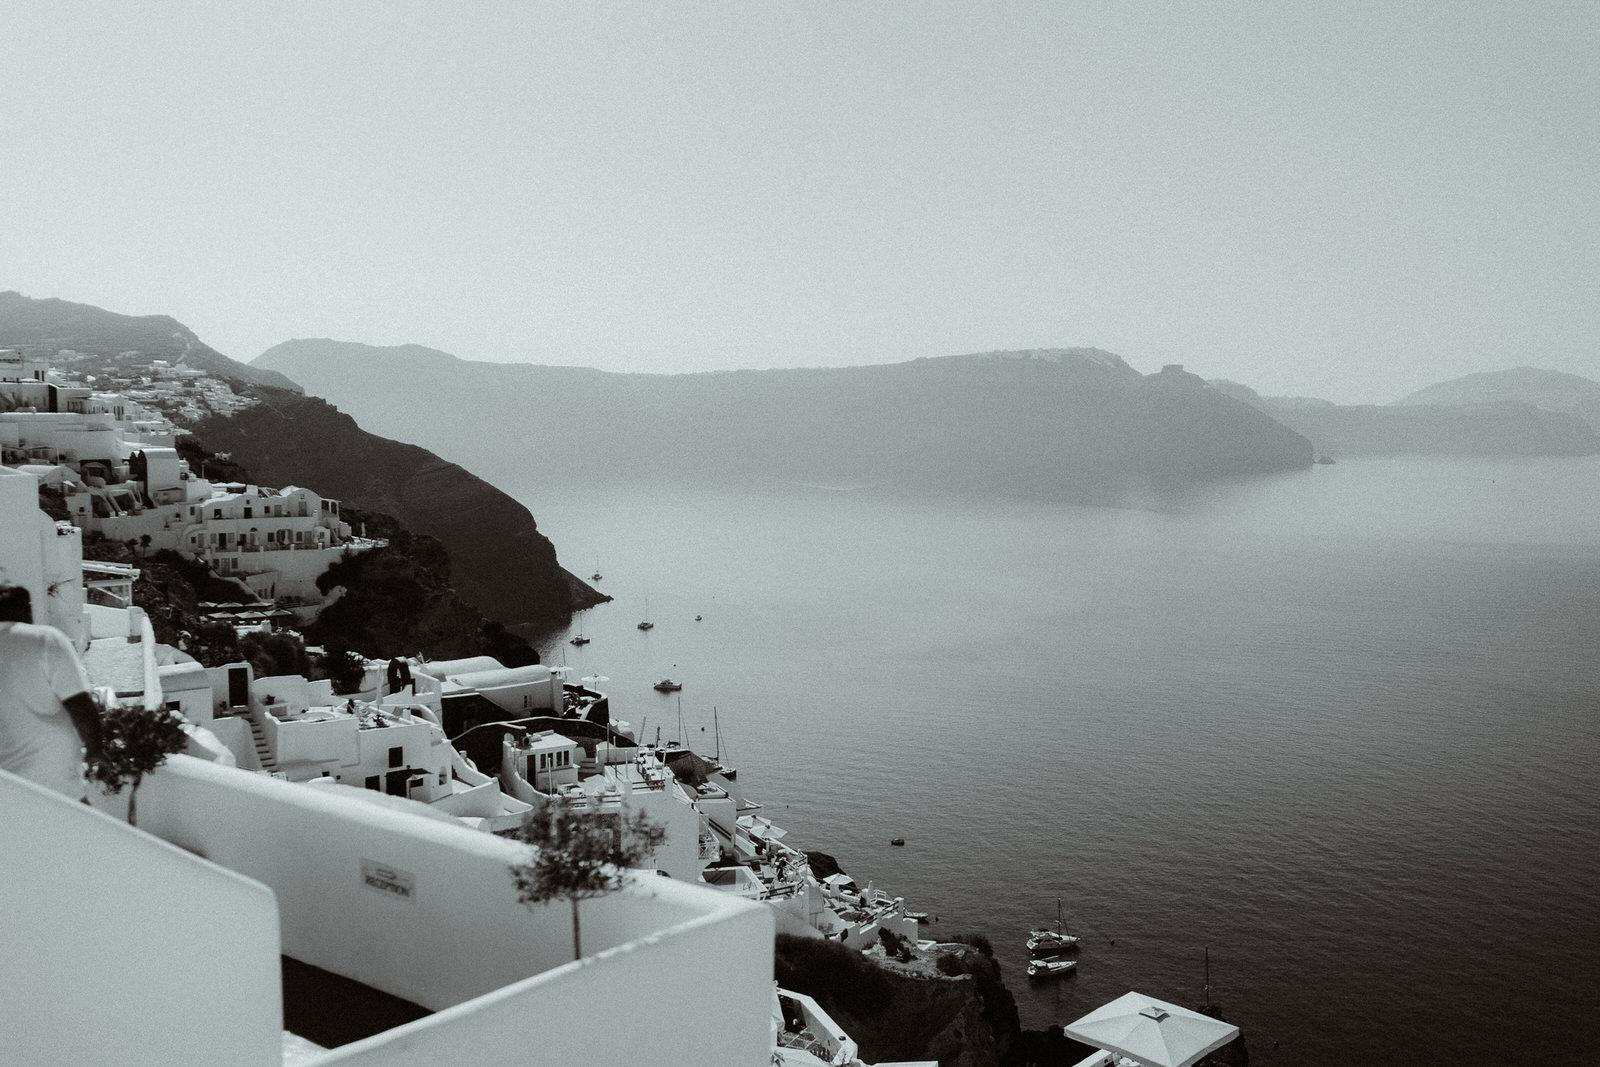 santorini-view-greek-islands